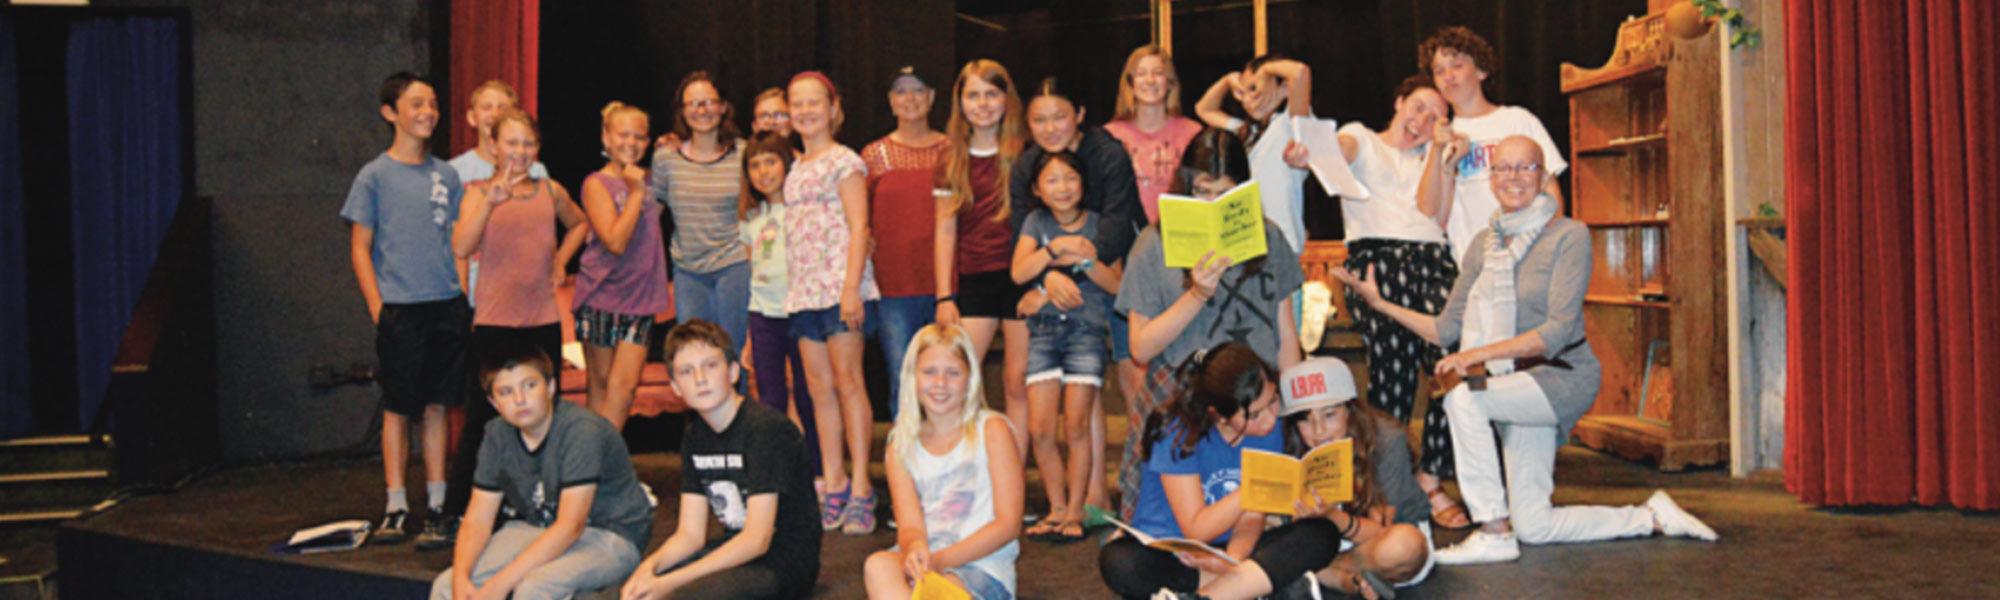 Summer Drama Camp at the Alcazar Theatre